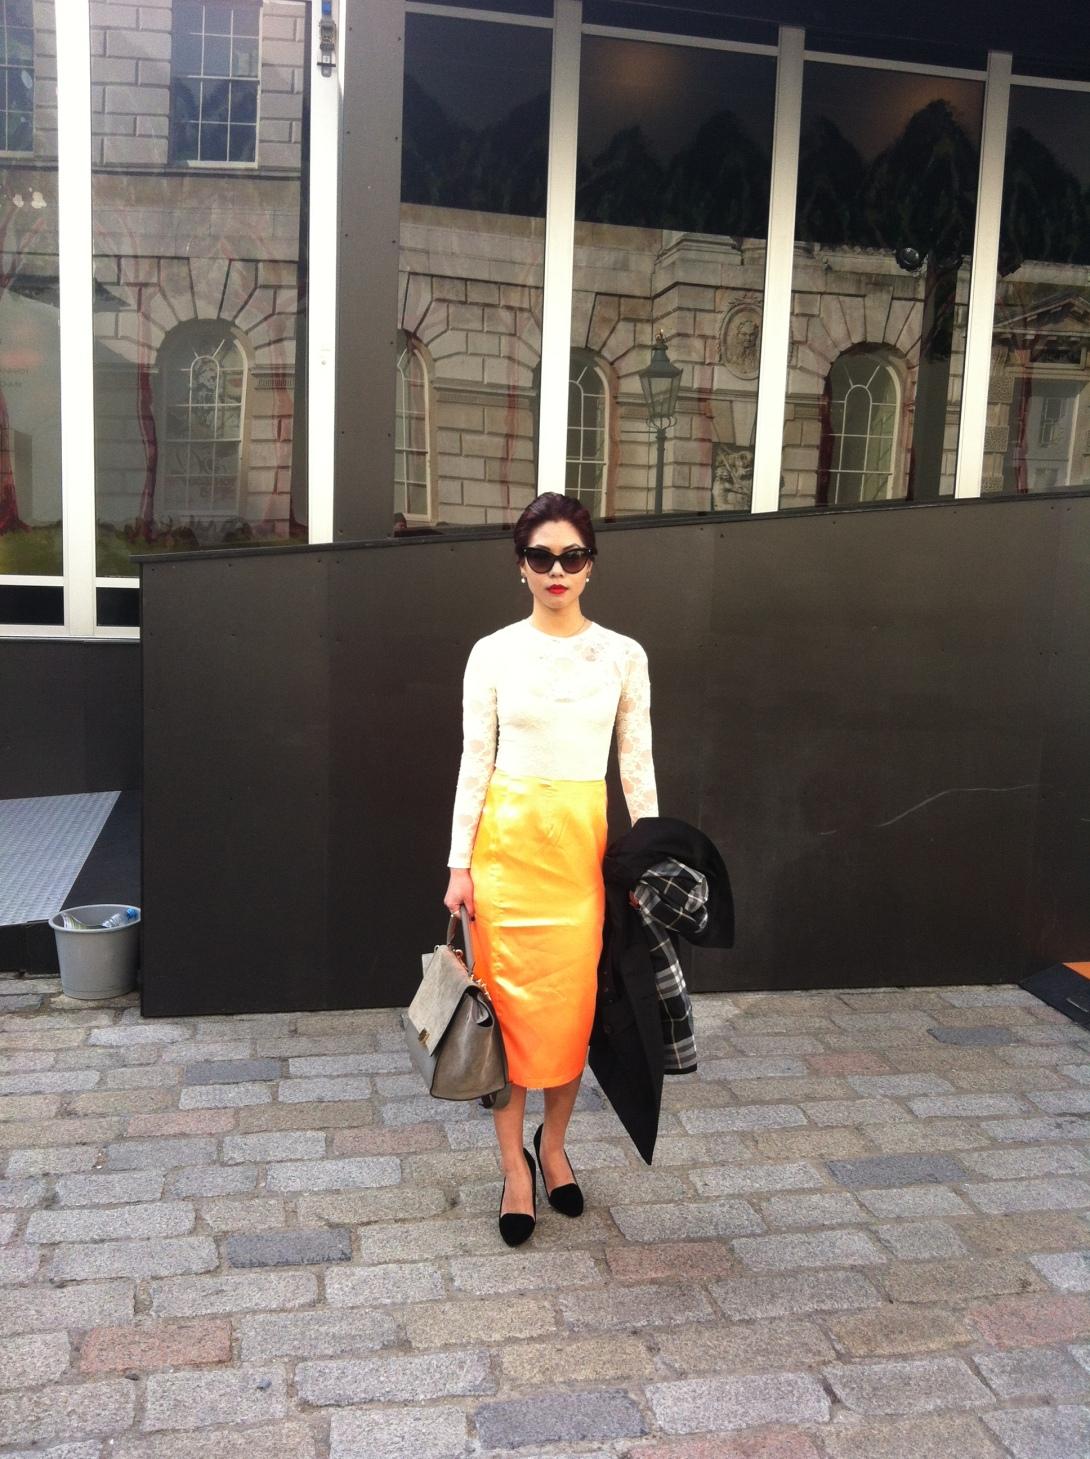 Fashionista - Streetstyle at London Fashion Week AW13